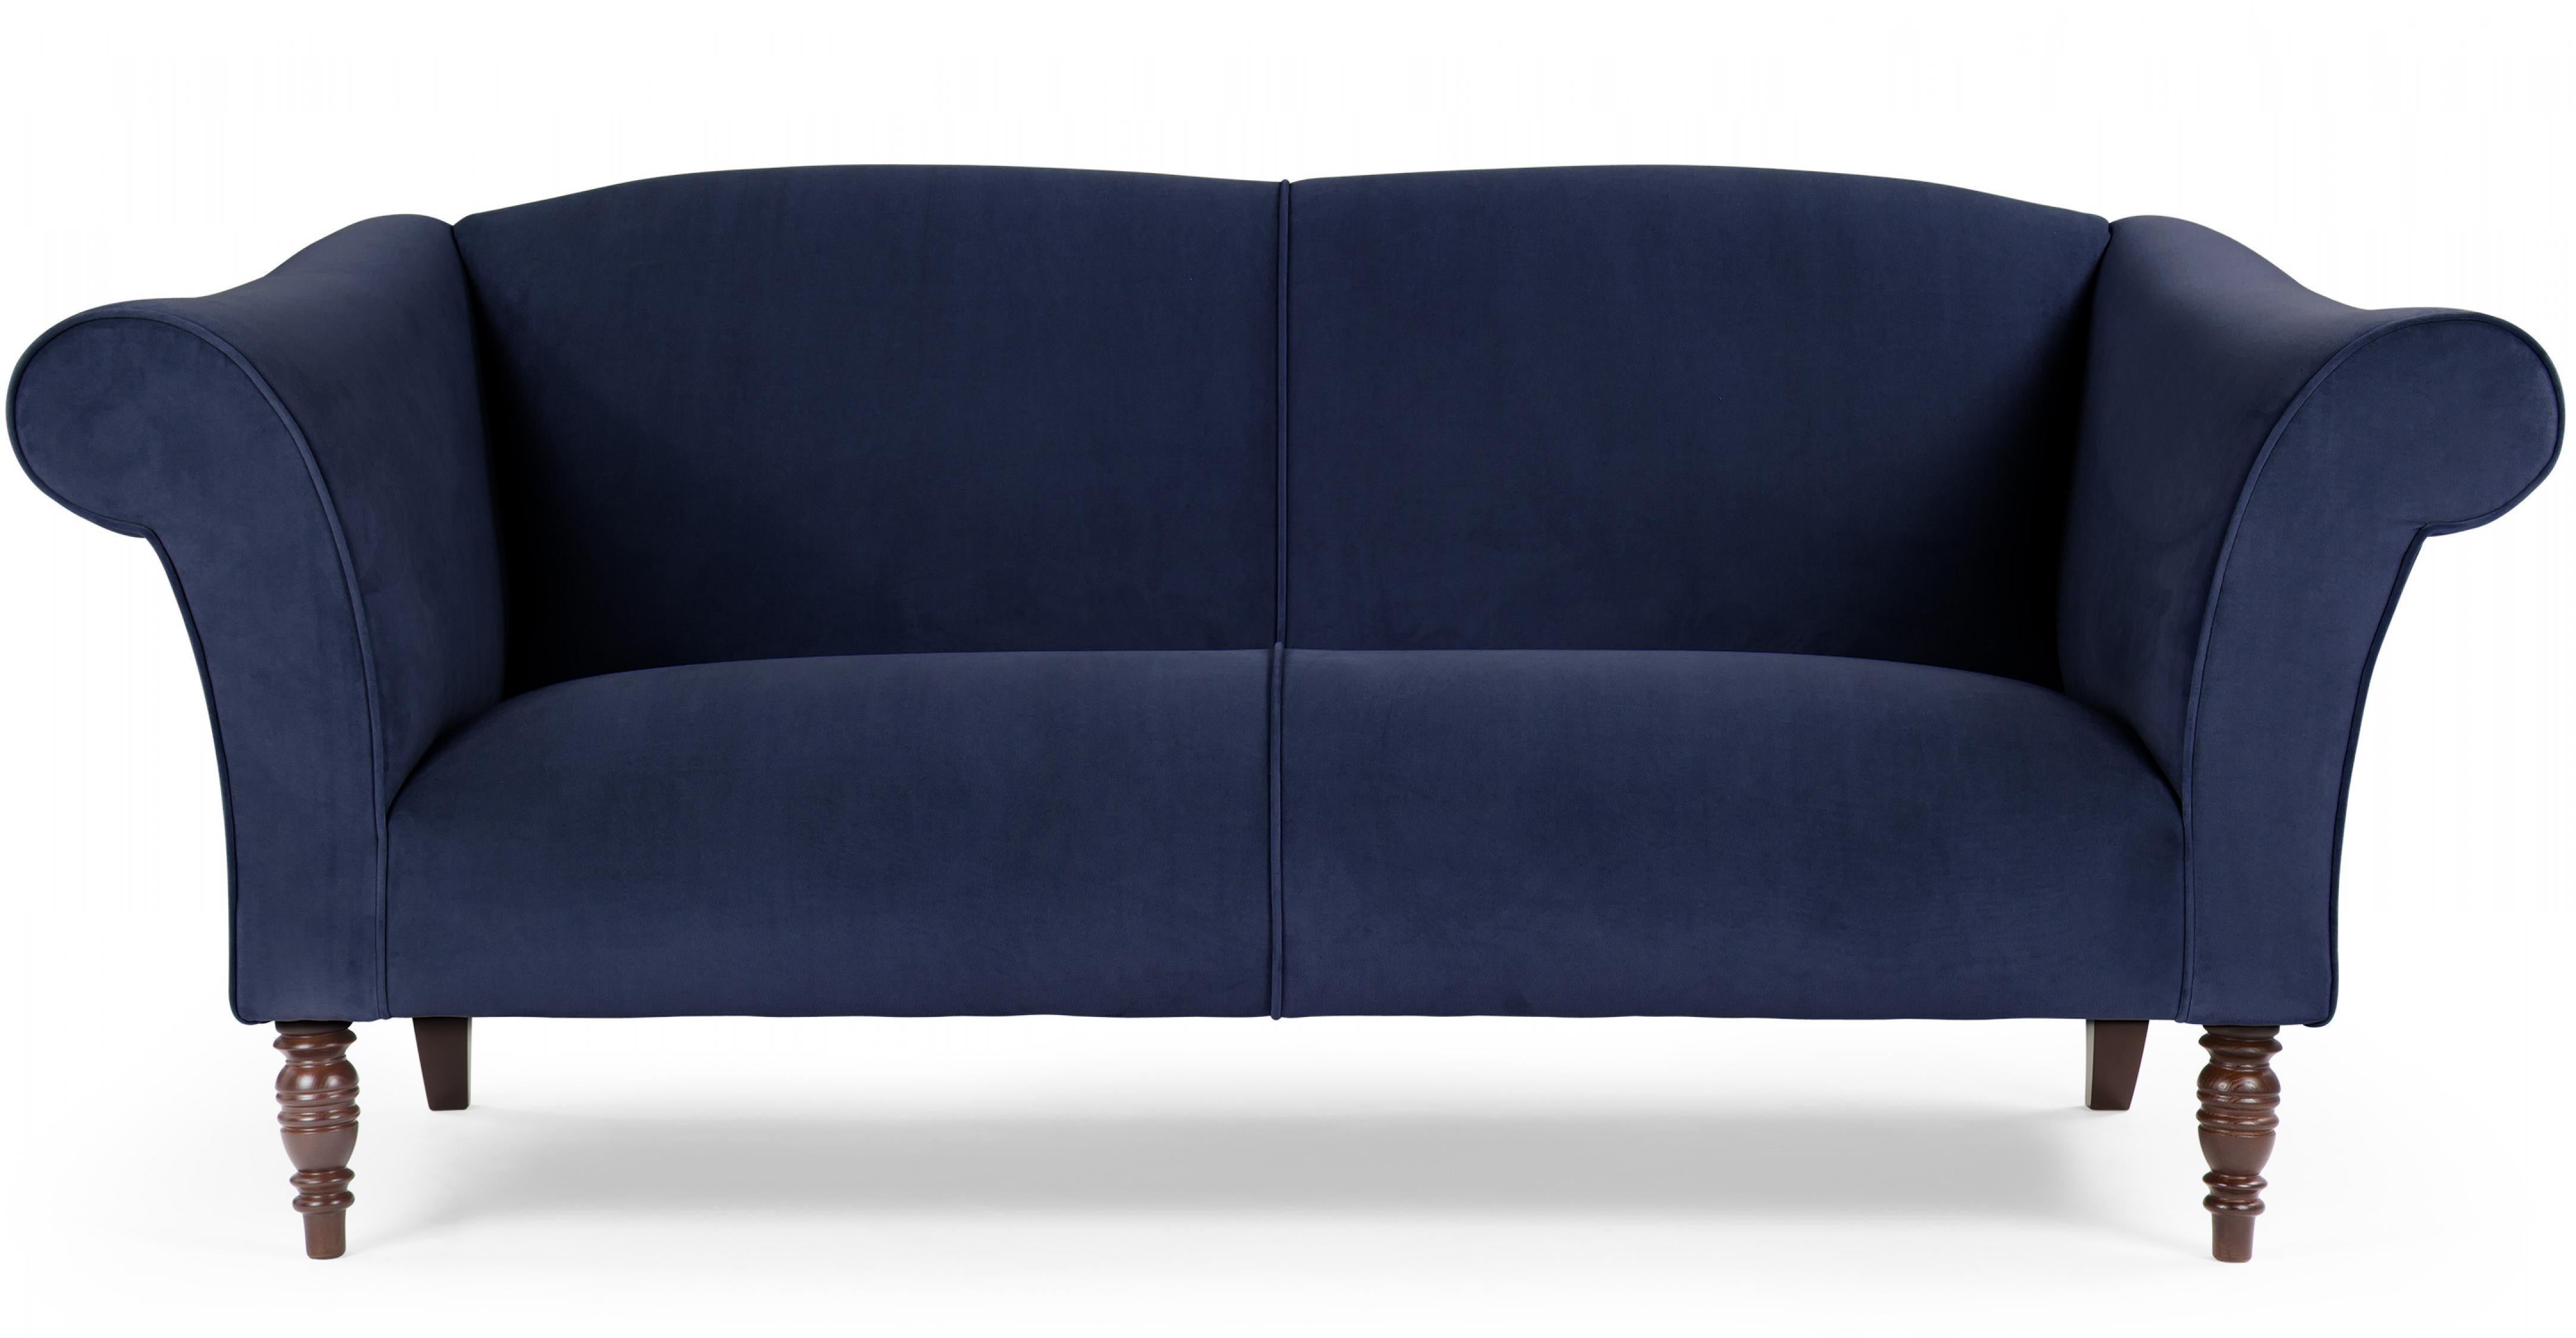 Canape Bleu Roi